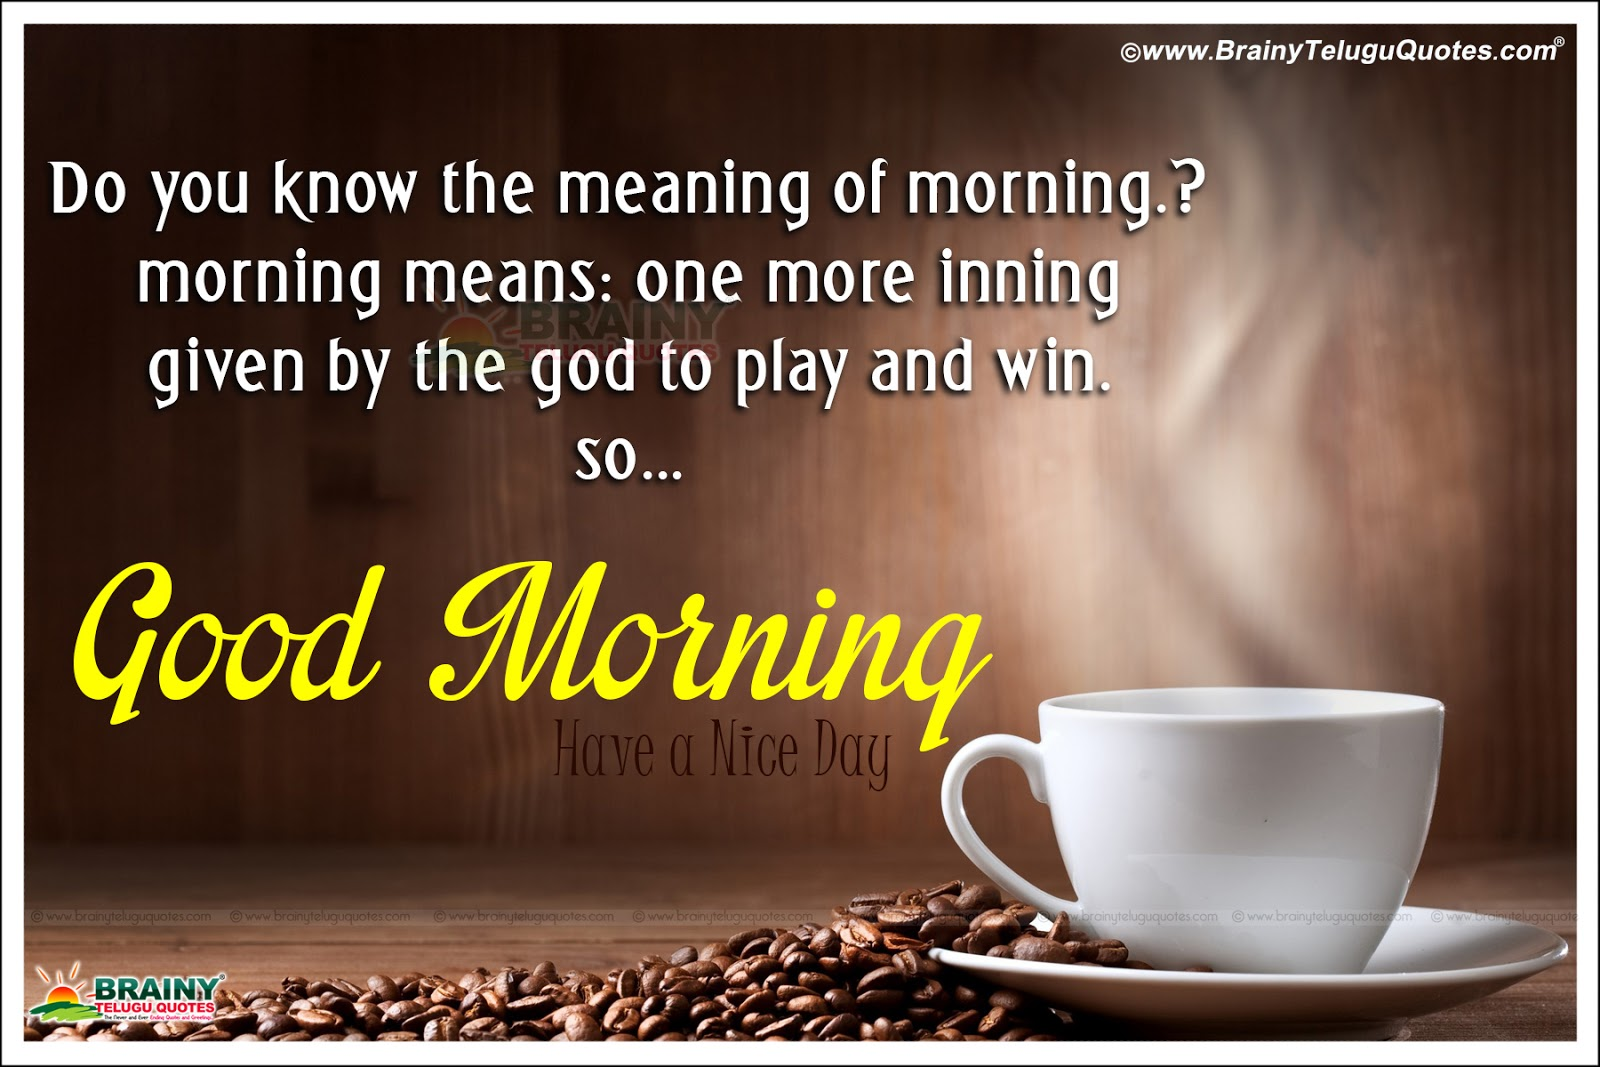 Vinayaka Chavithi Hd Wallpapers Inspirational Good Morning Messages Motivations Wallpapers